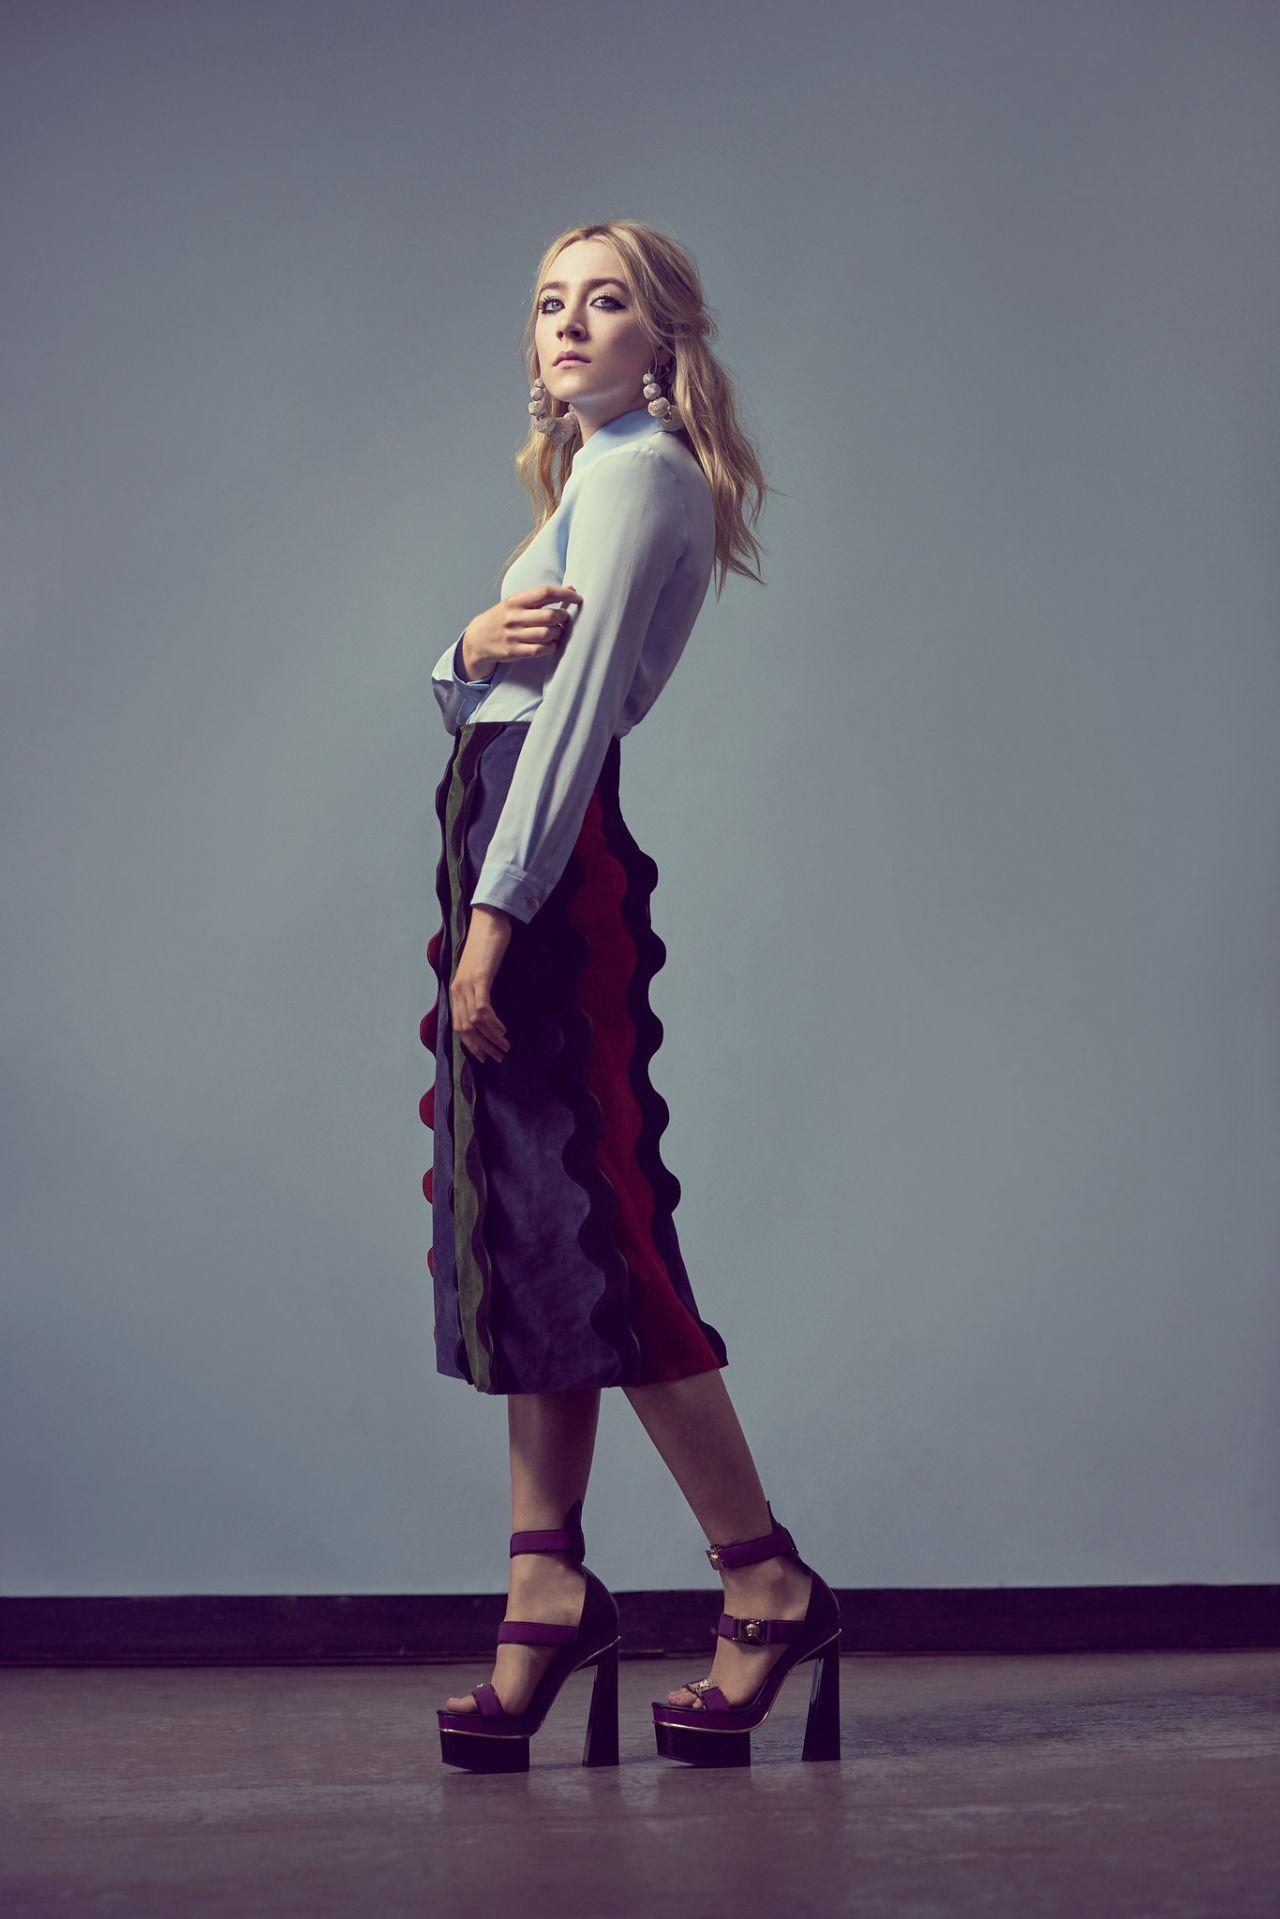 Saoirse Ronan Photo Shoot For Flaunt Magazine April 2016